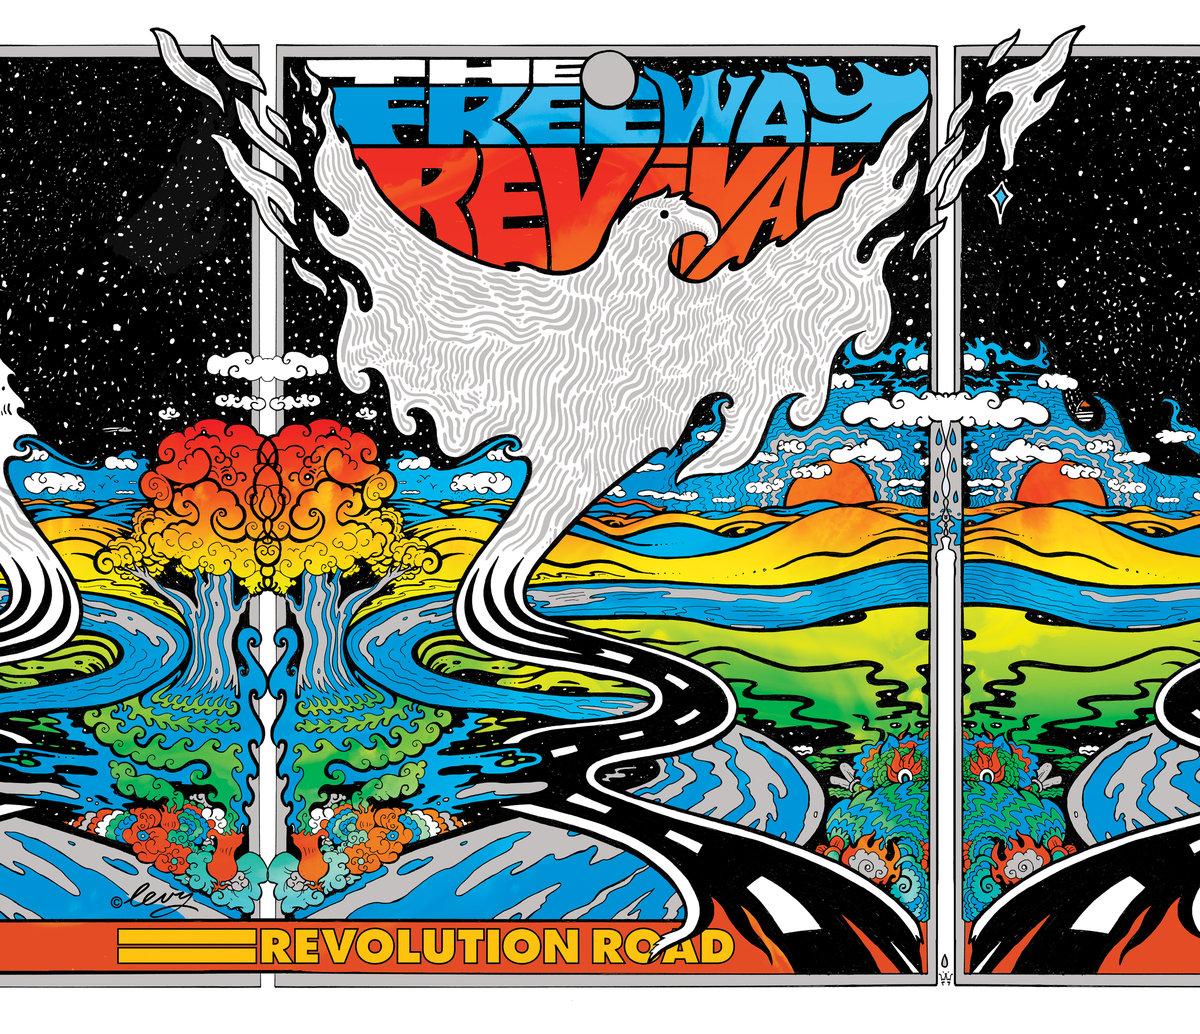 Album Review: The Freeway Revival, Revolution Road